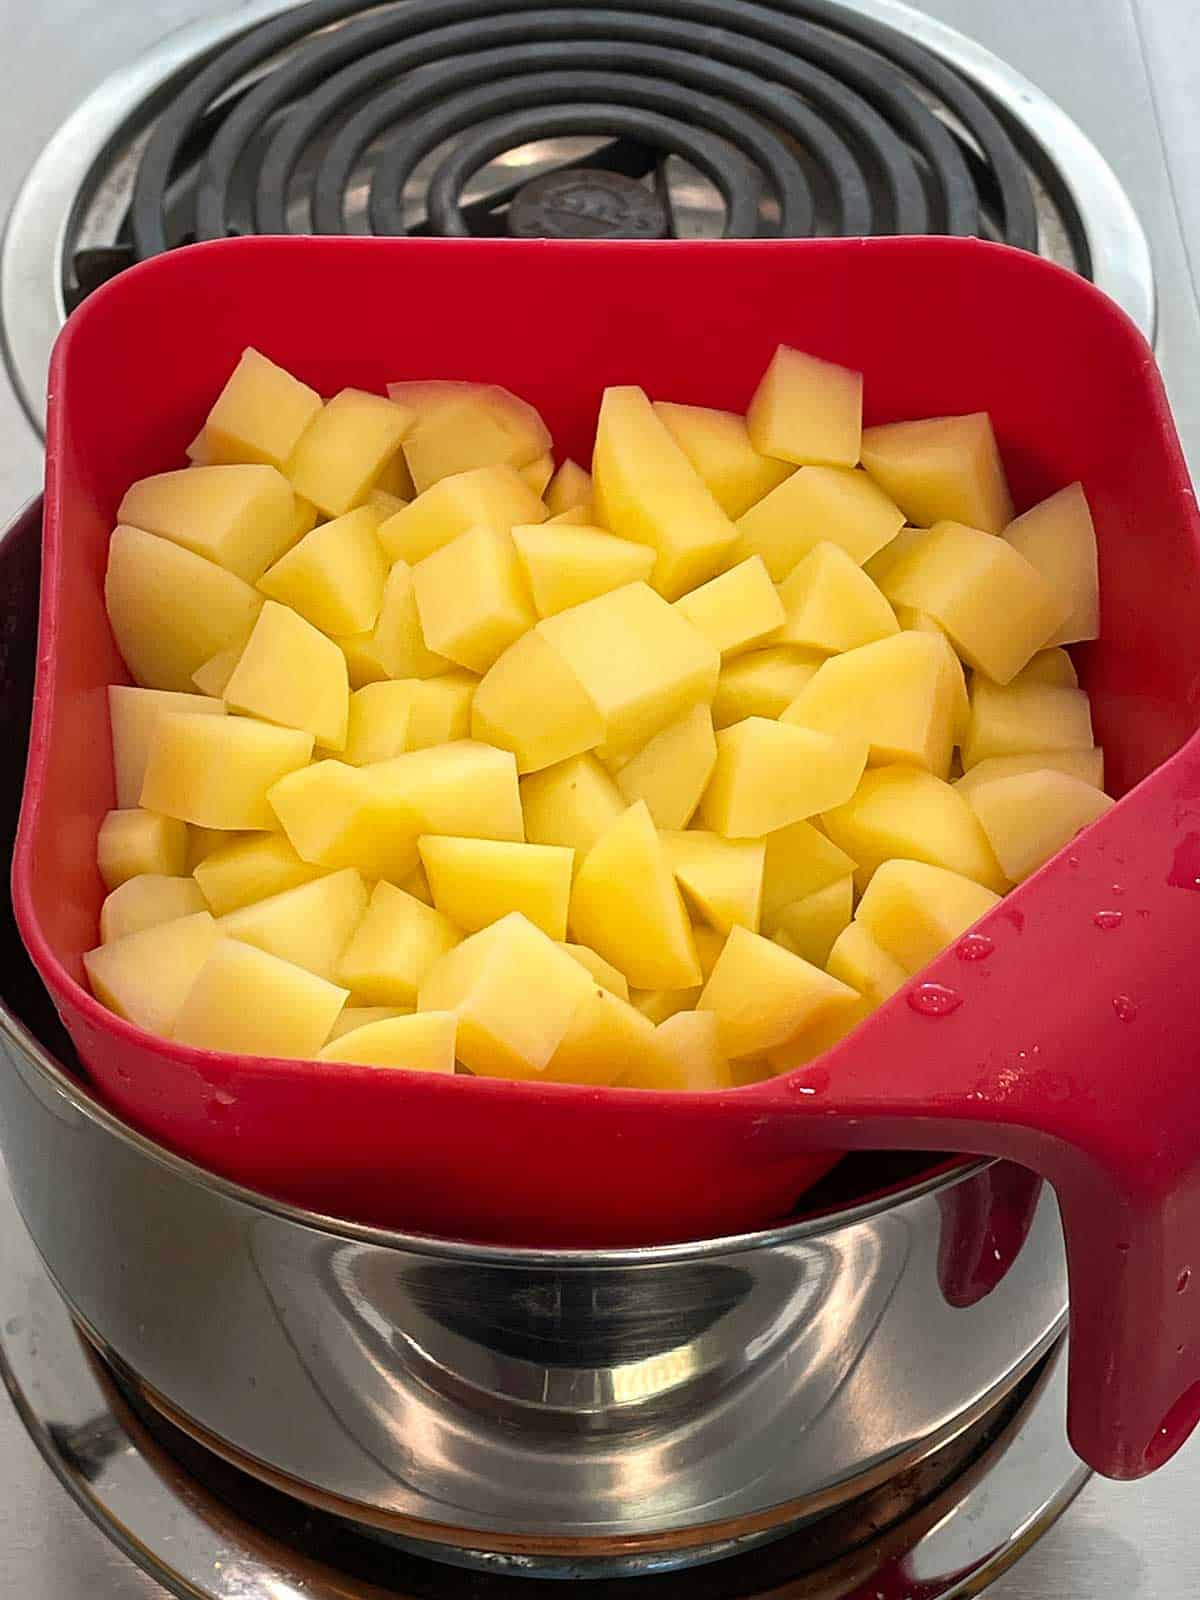 Draining the potatoes.